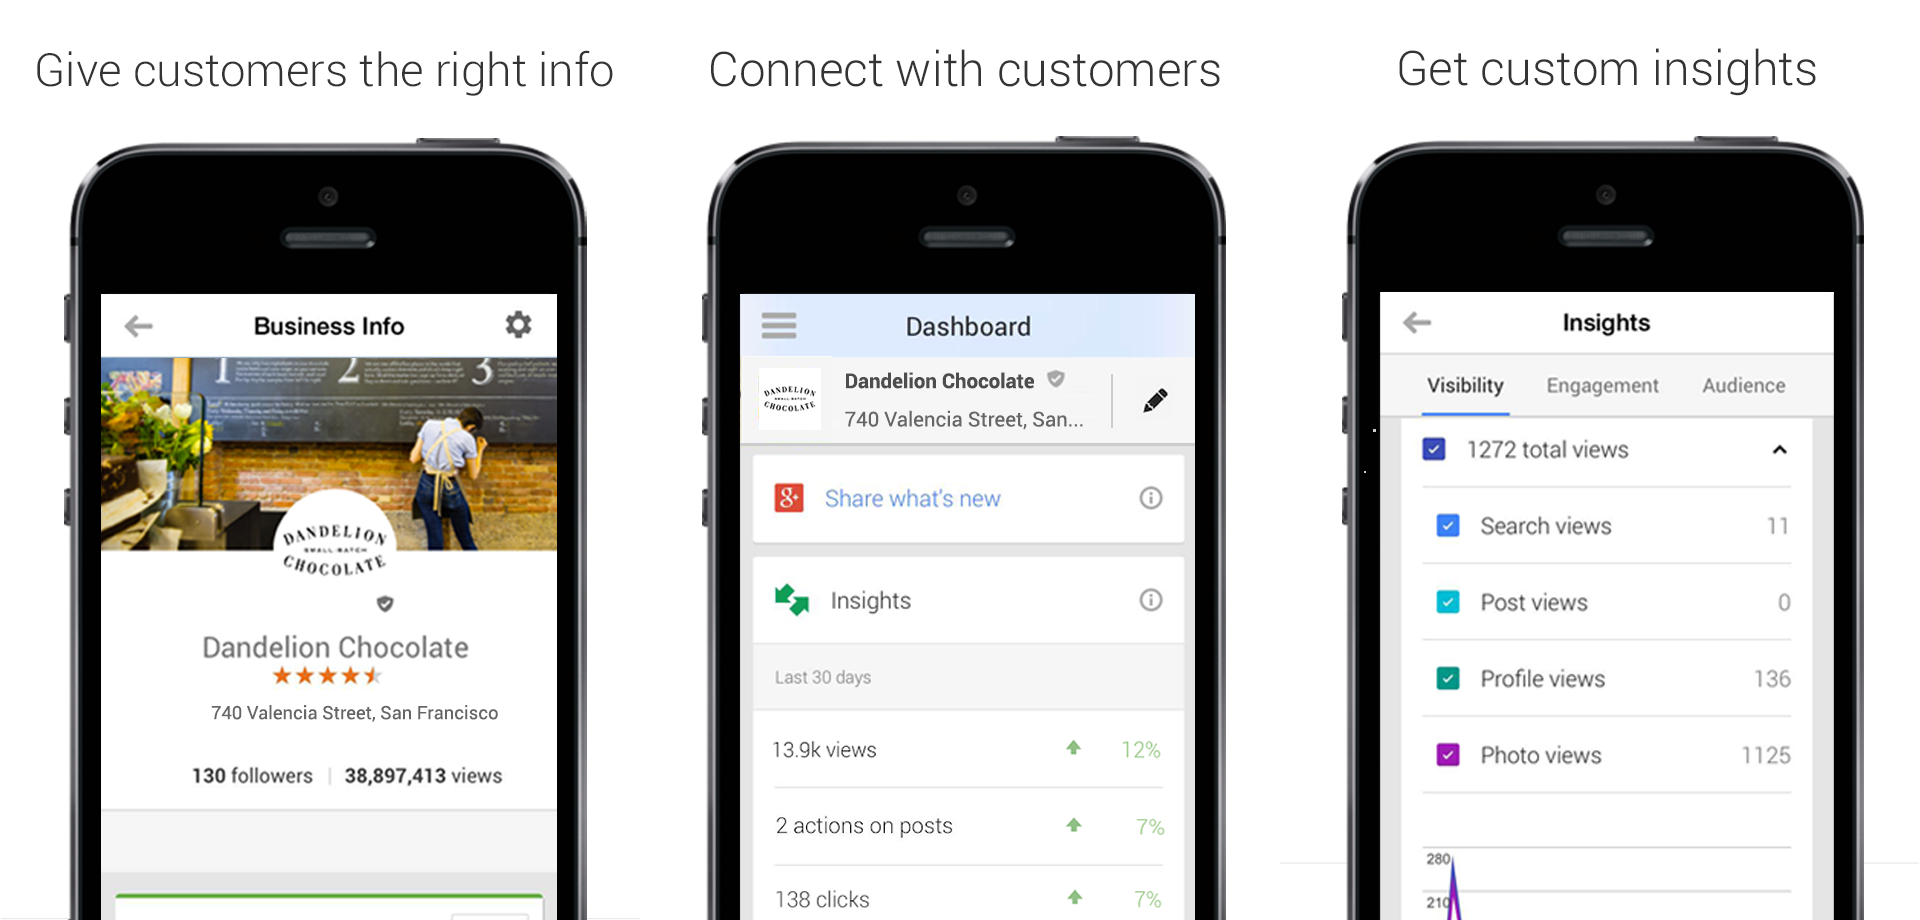 Aplikace Moje firma na Googlu – nyní i pro iOS [aktualizováno]